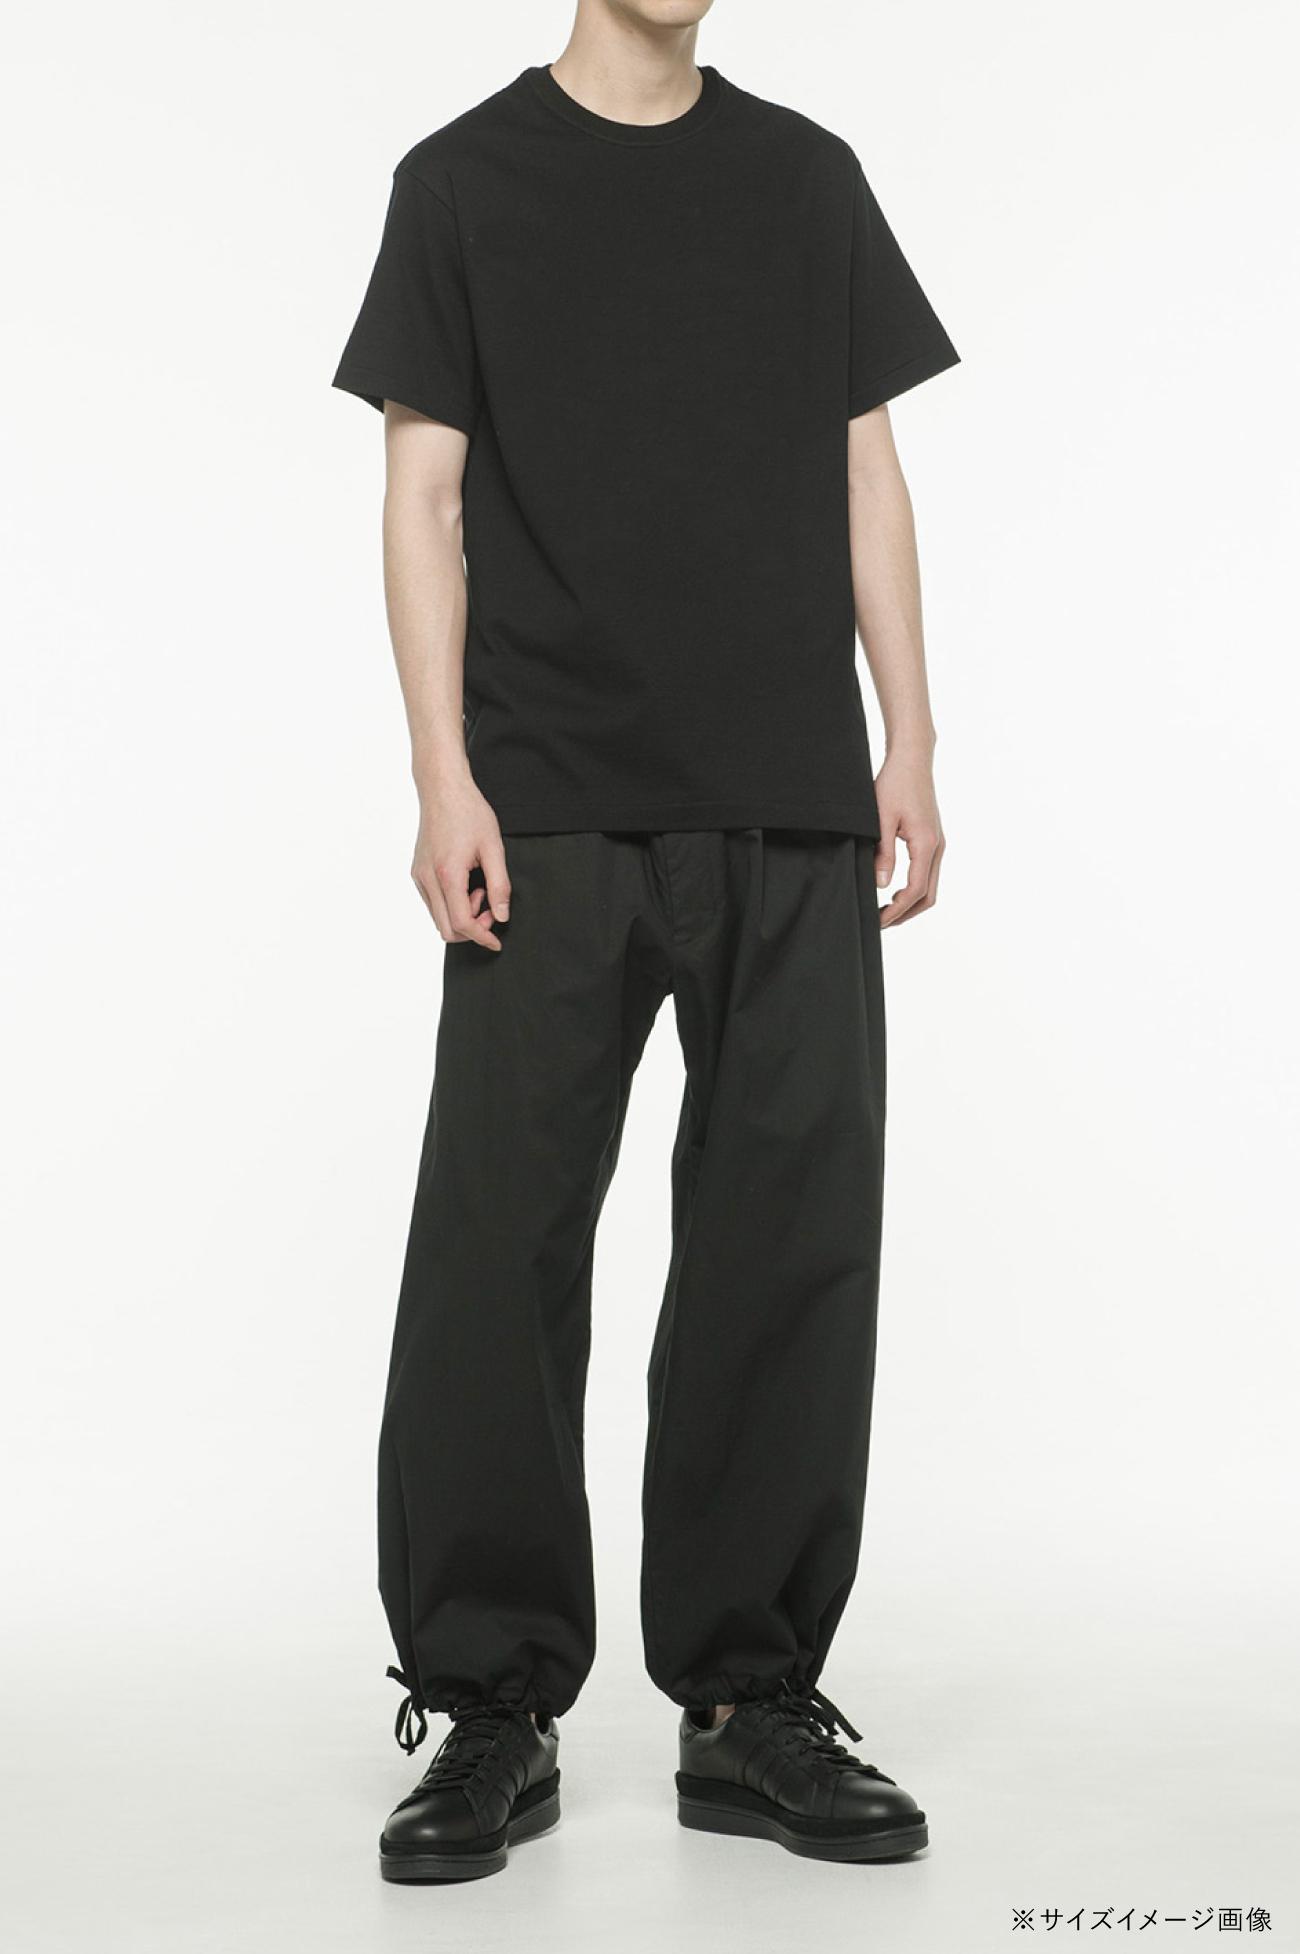 20/Cotton Jersey Black Shadow On Blue Peony T-Shirt